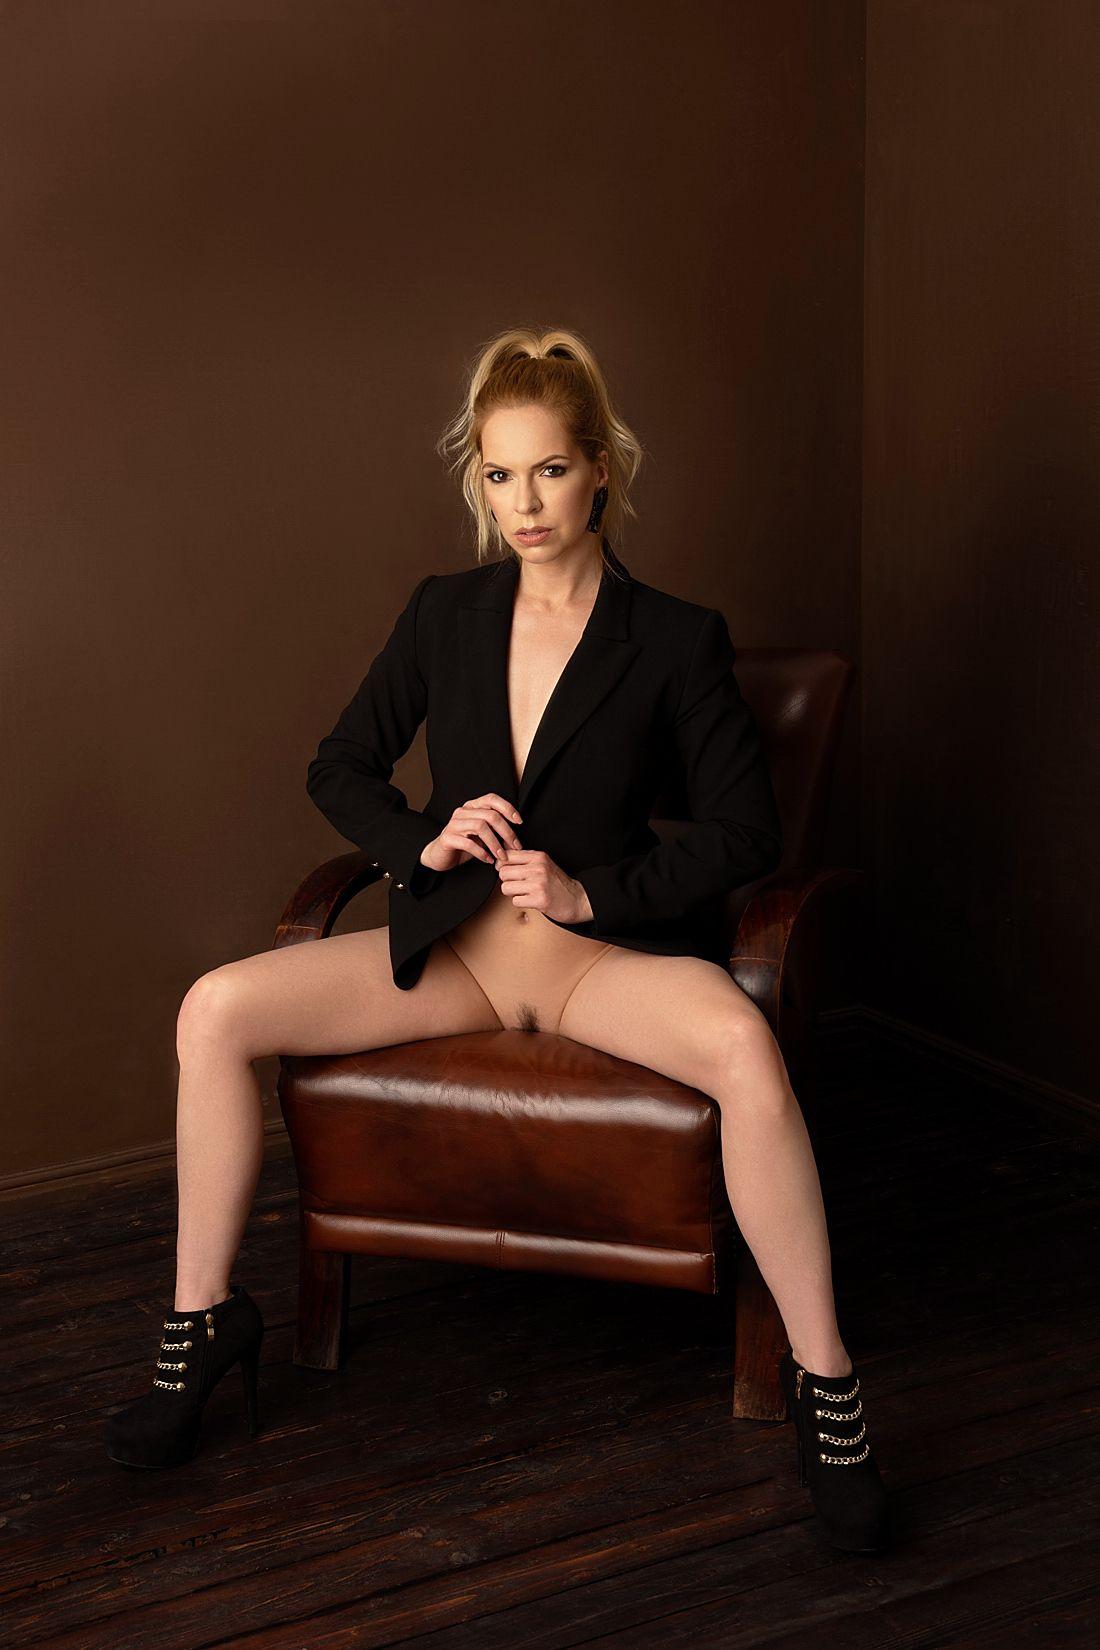 model, fine art, nude, naked, fashion nude,sexy, sensual, colour, woman, female, body, erotica, glamour, curves, portrait, beautiful, fashion,, Lajos Csáki